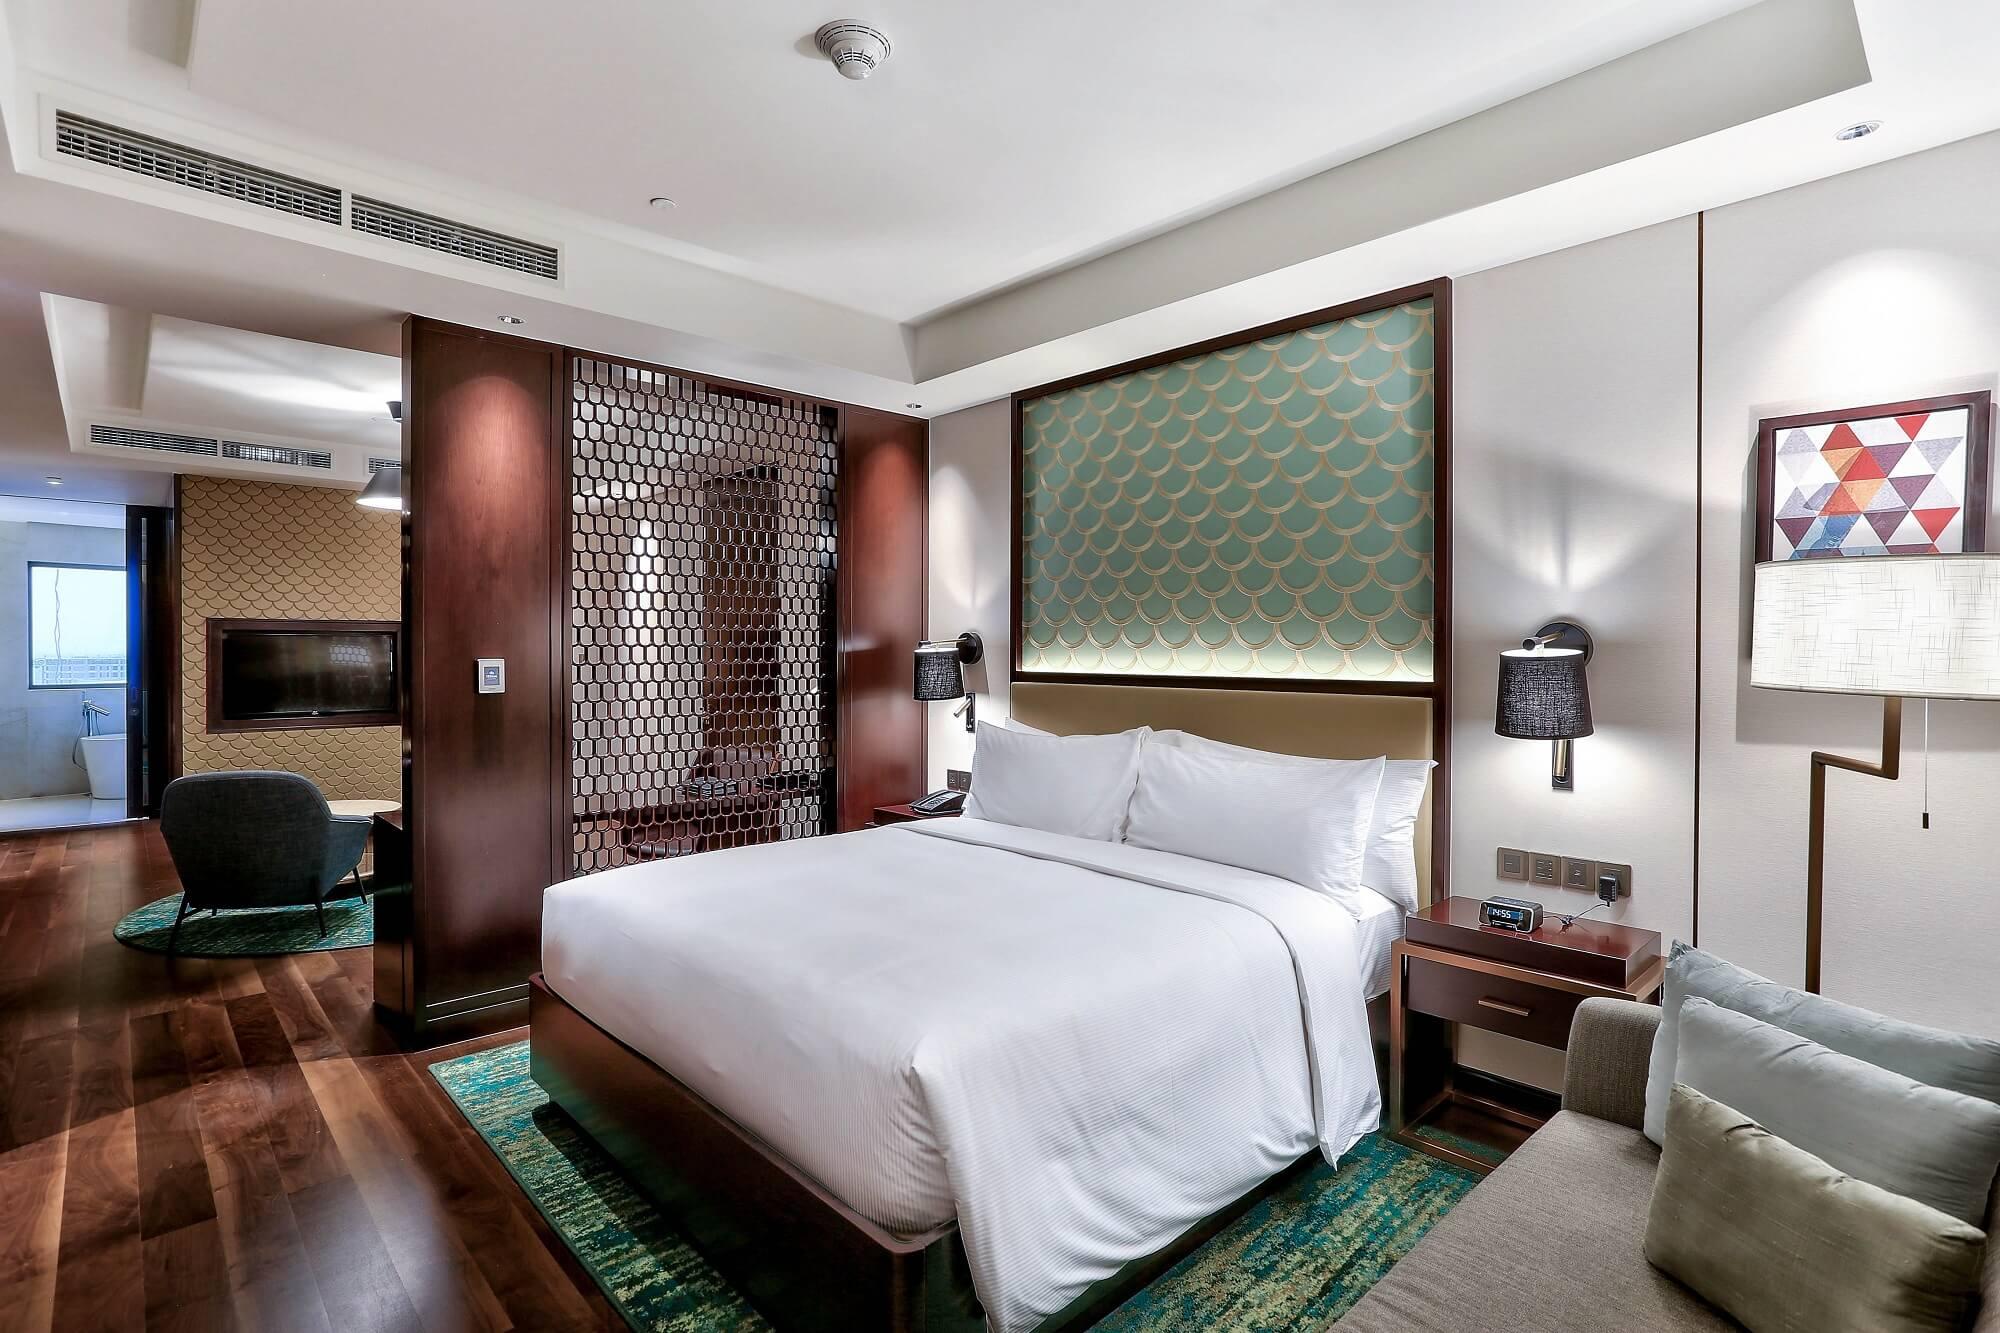 One Bedroom Suite Ocean View Hilton Da Nang Trai Nghiem Khach San Day Phong Cach Giua Long Thanh Pho Danang Fantasticity